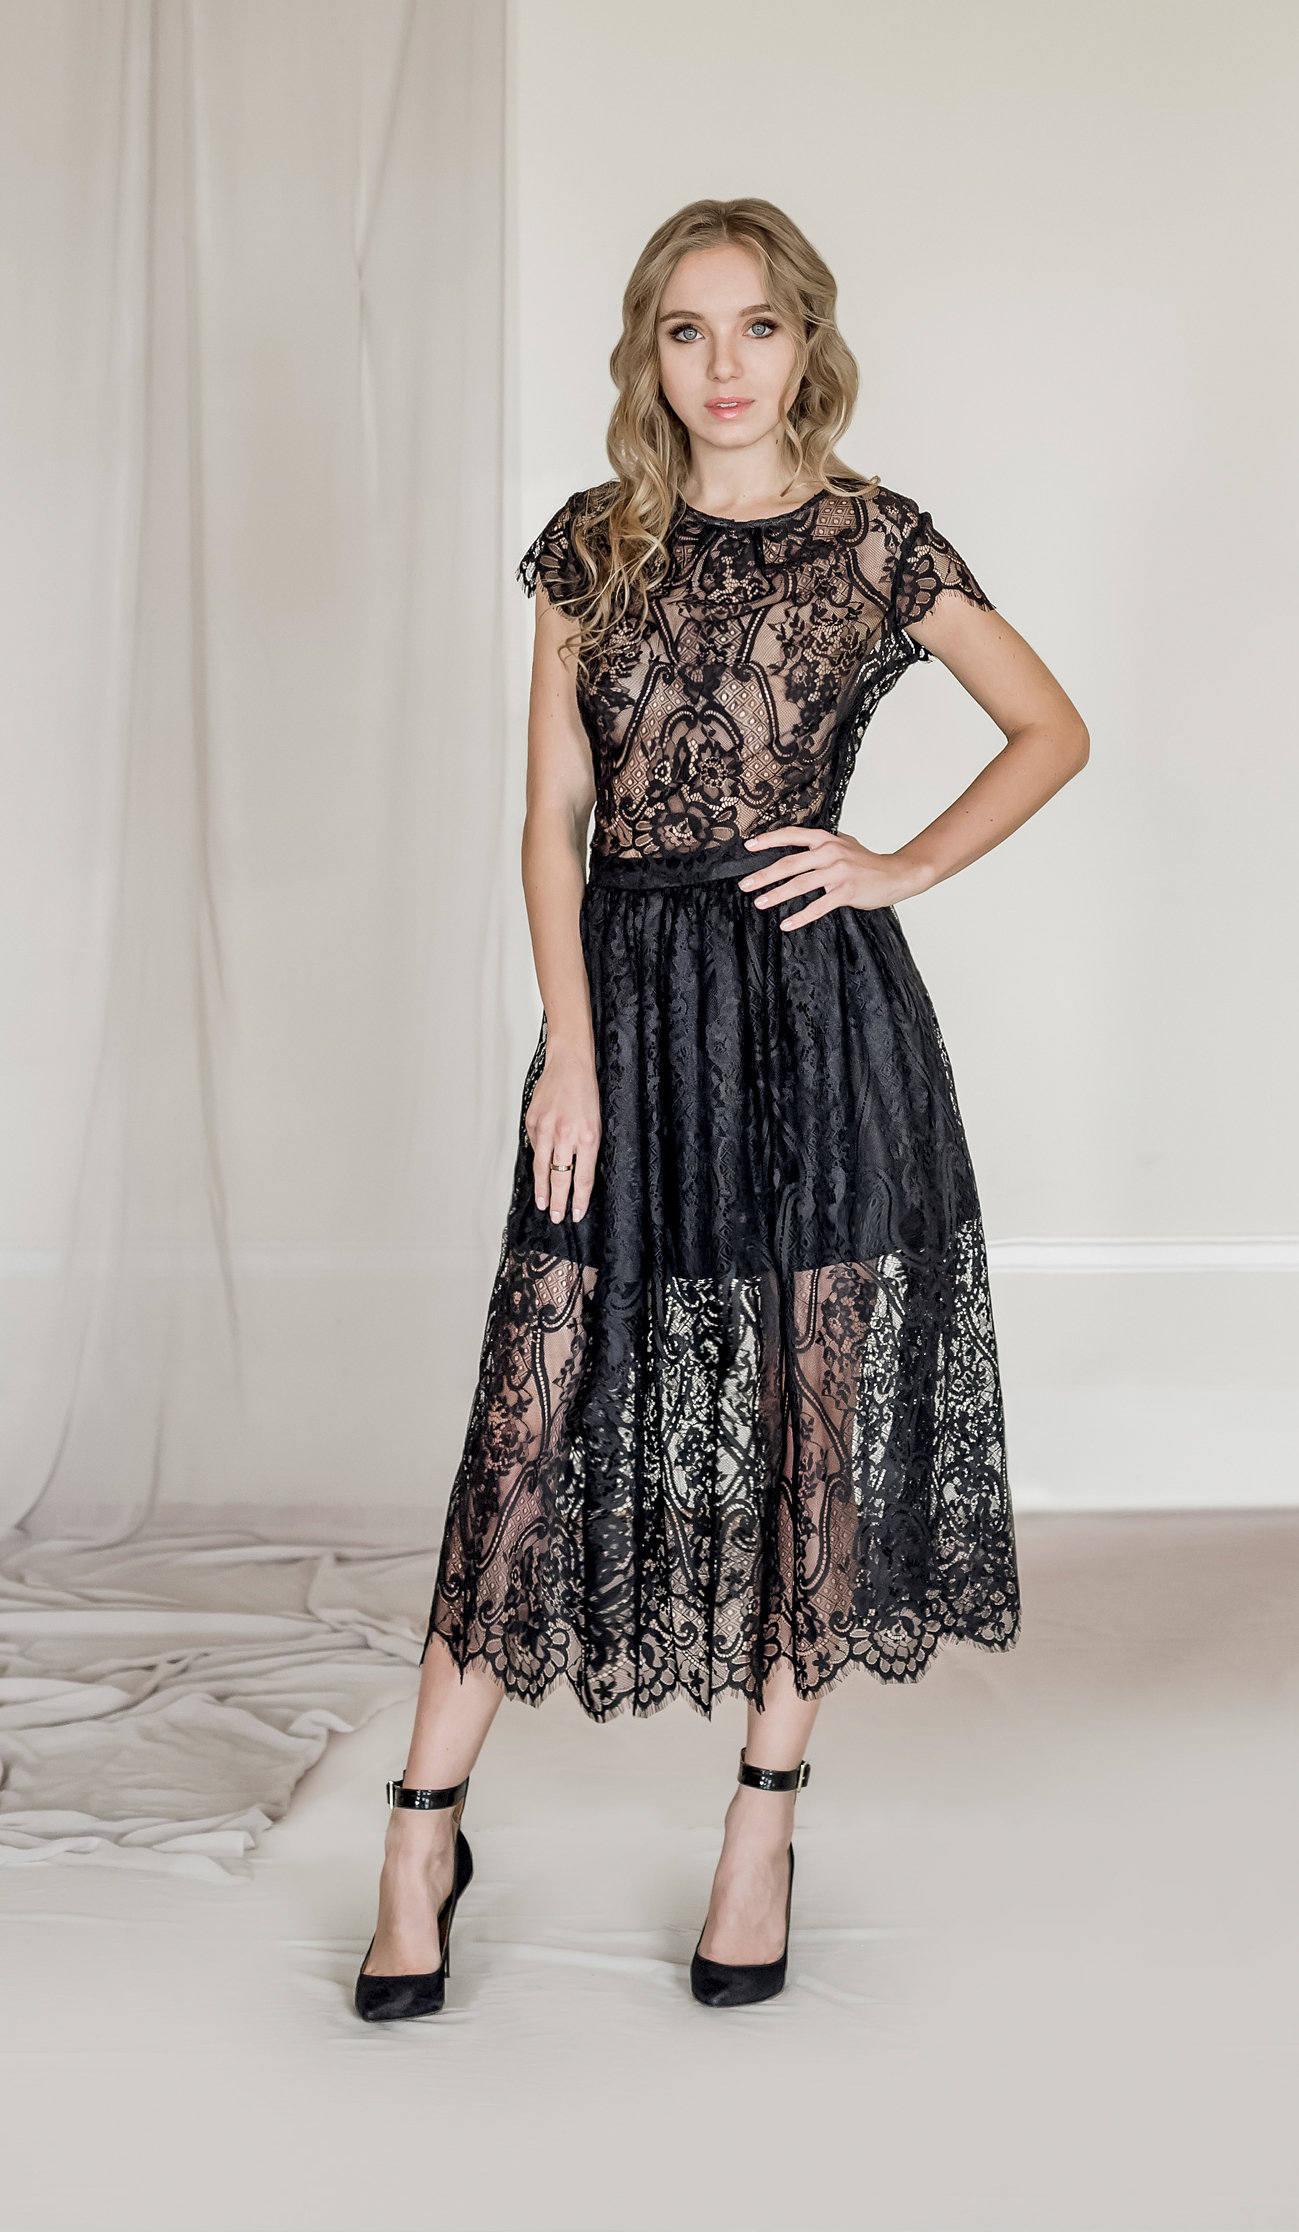 2 Stück Spitze-Abend-Outfit schwarze Spitzentop Rock aus